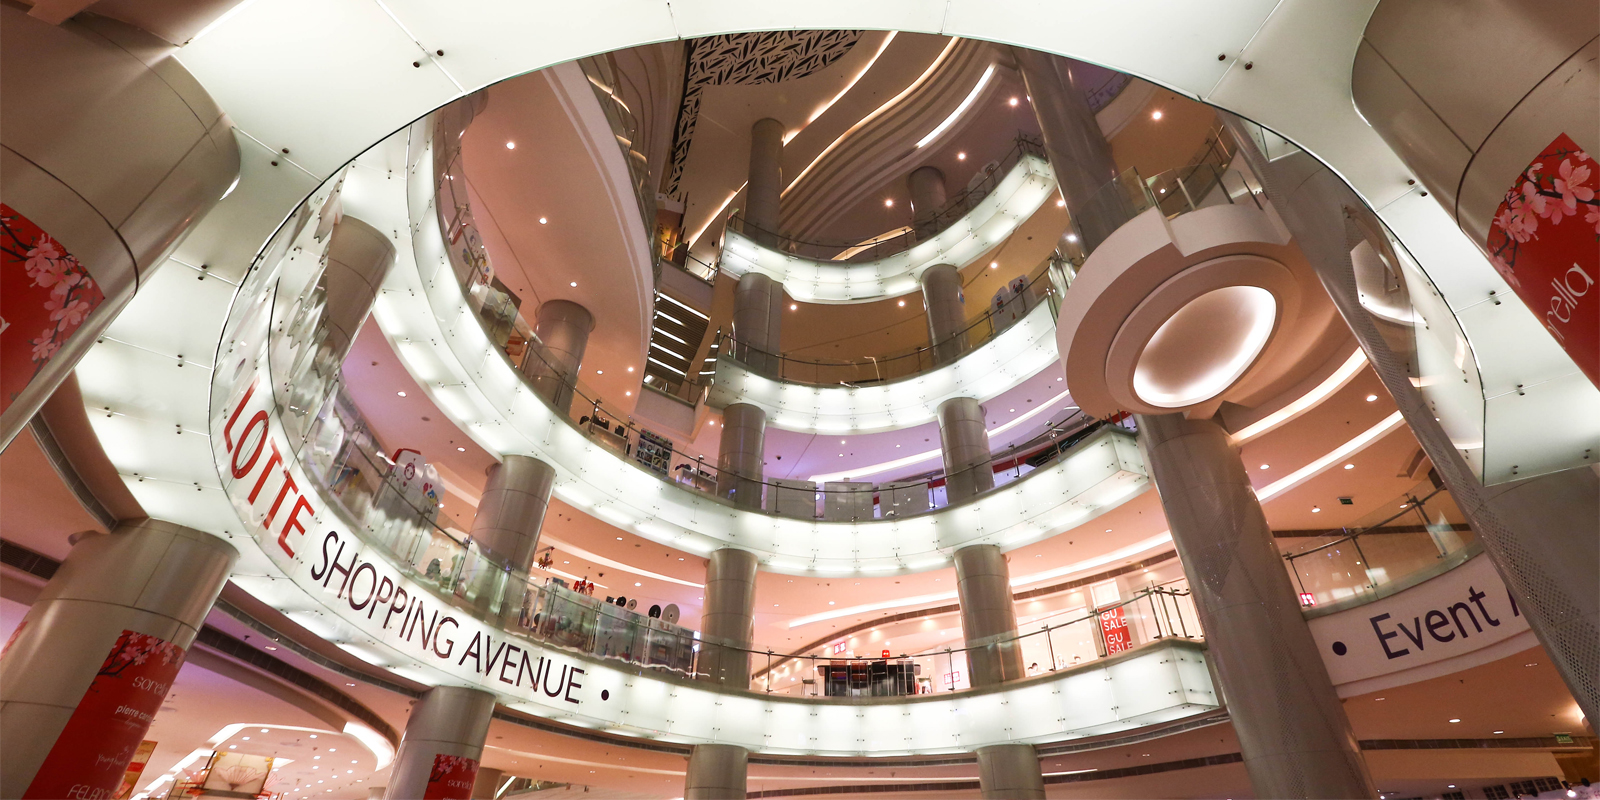 Lotte Shopping Avenue Ciputra World Jakarta 1